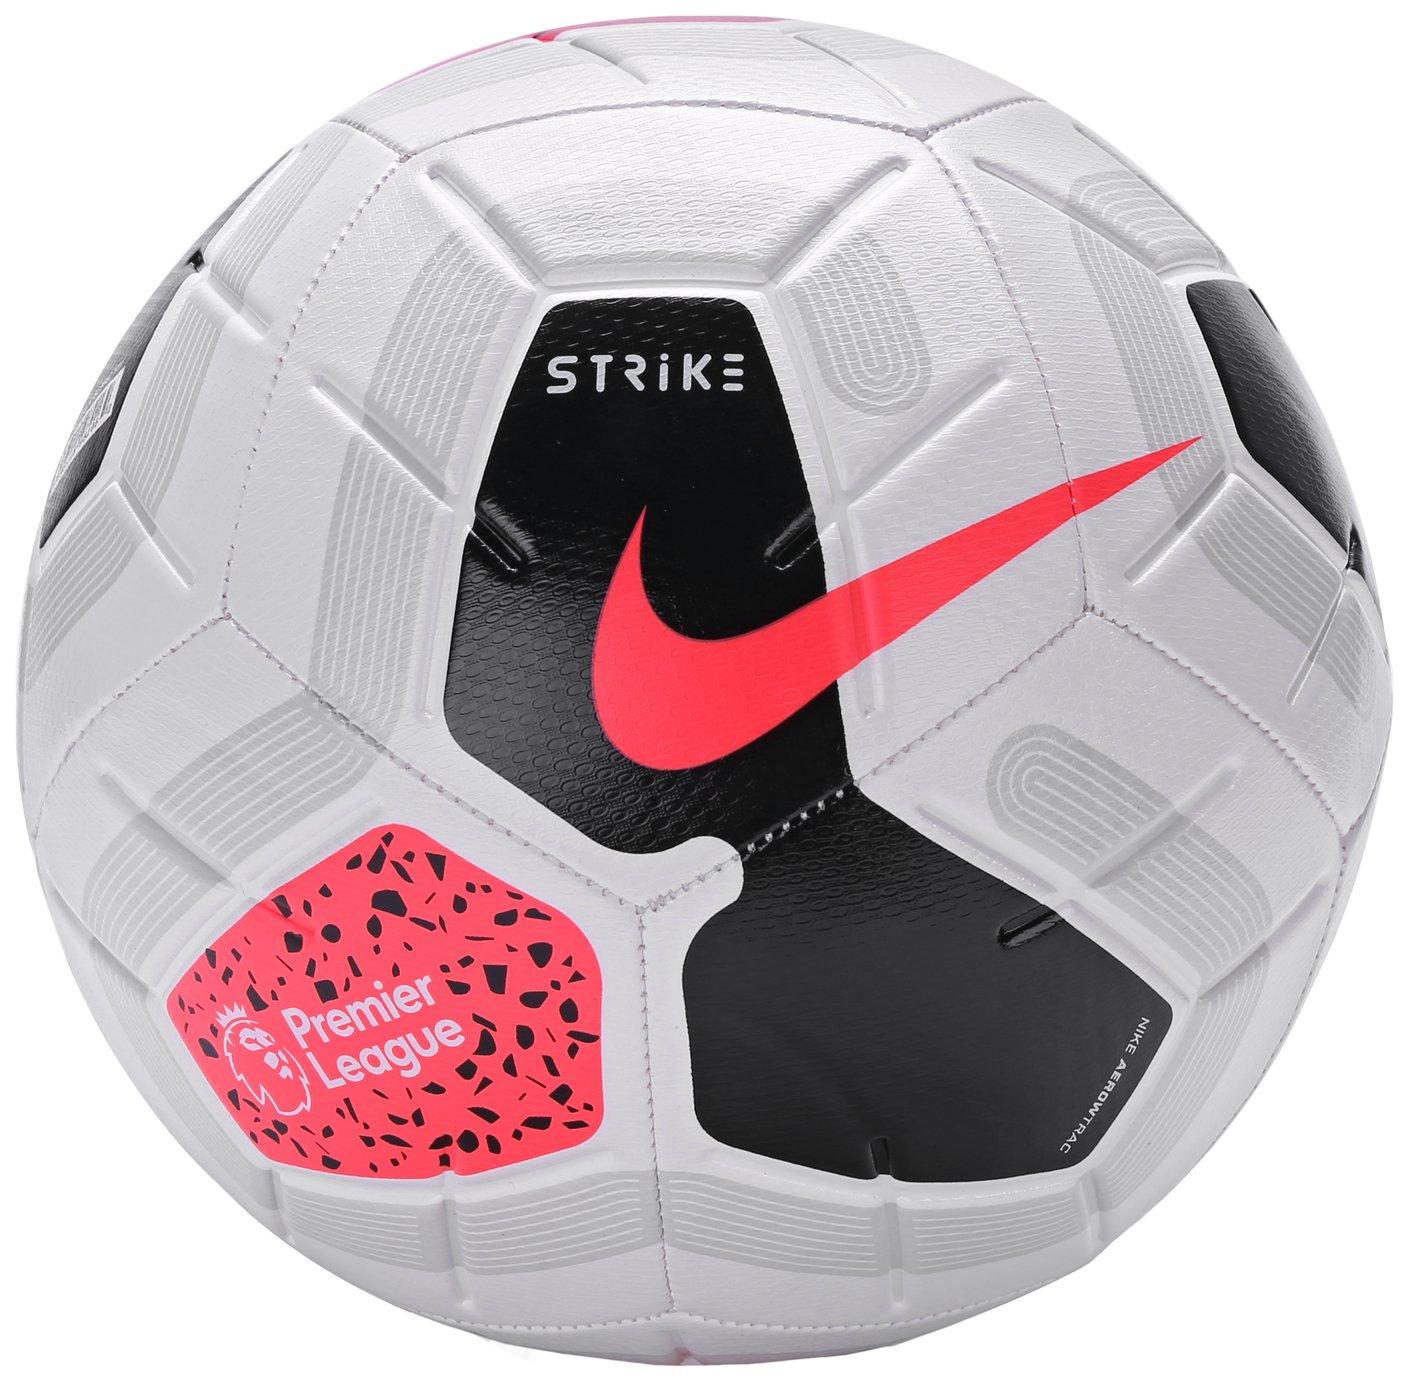 Nike Premier League Strike Size 5 Football